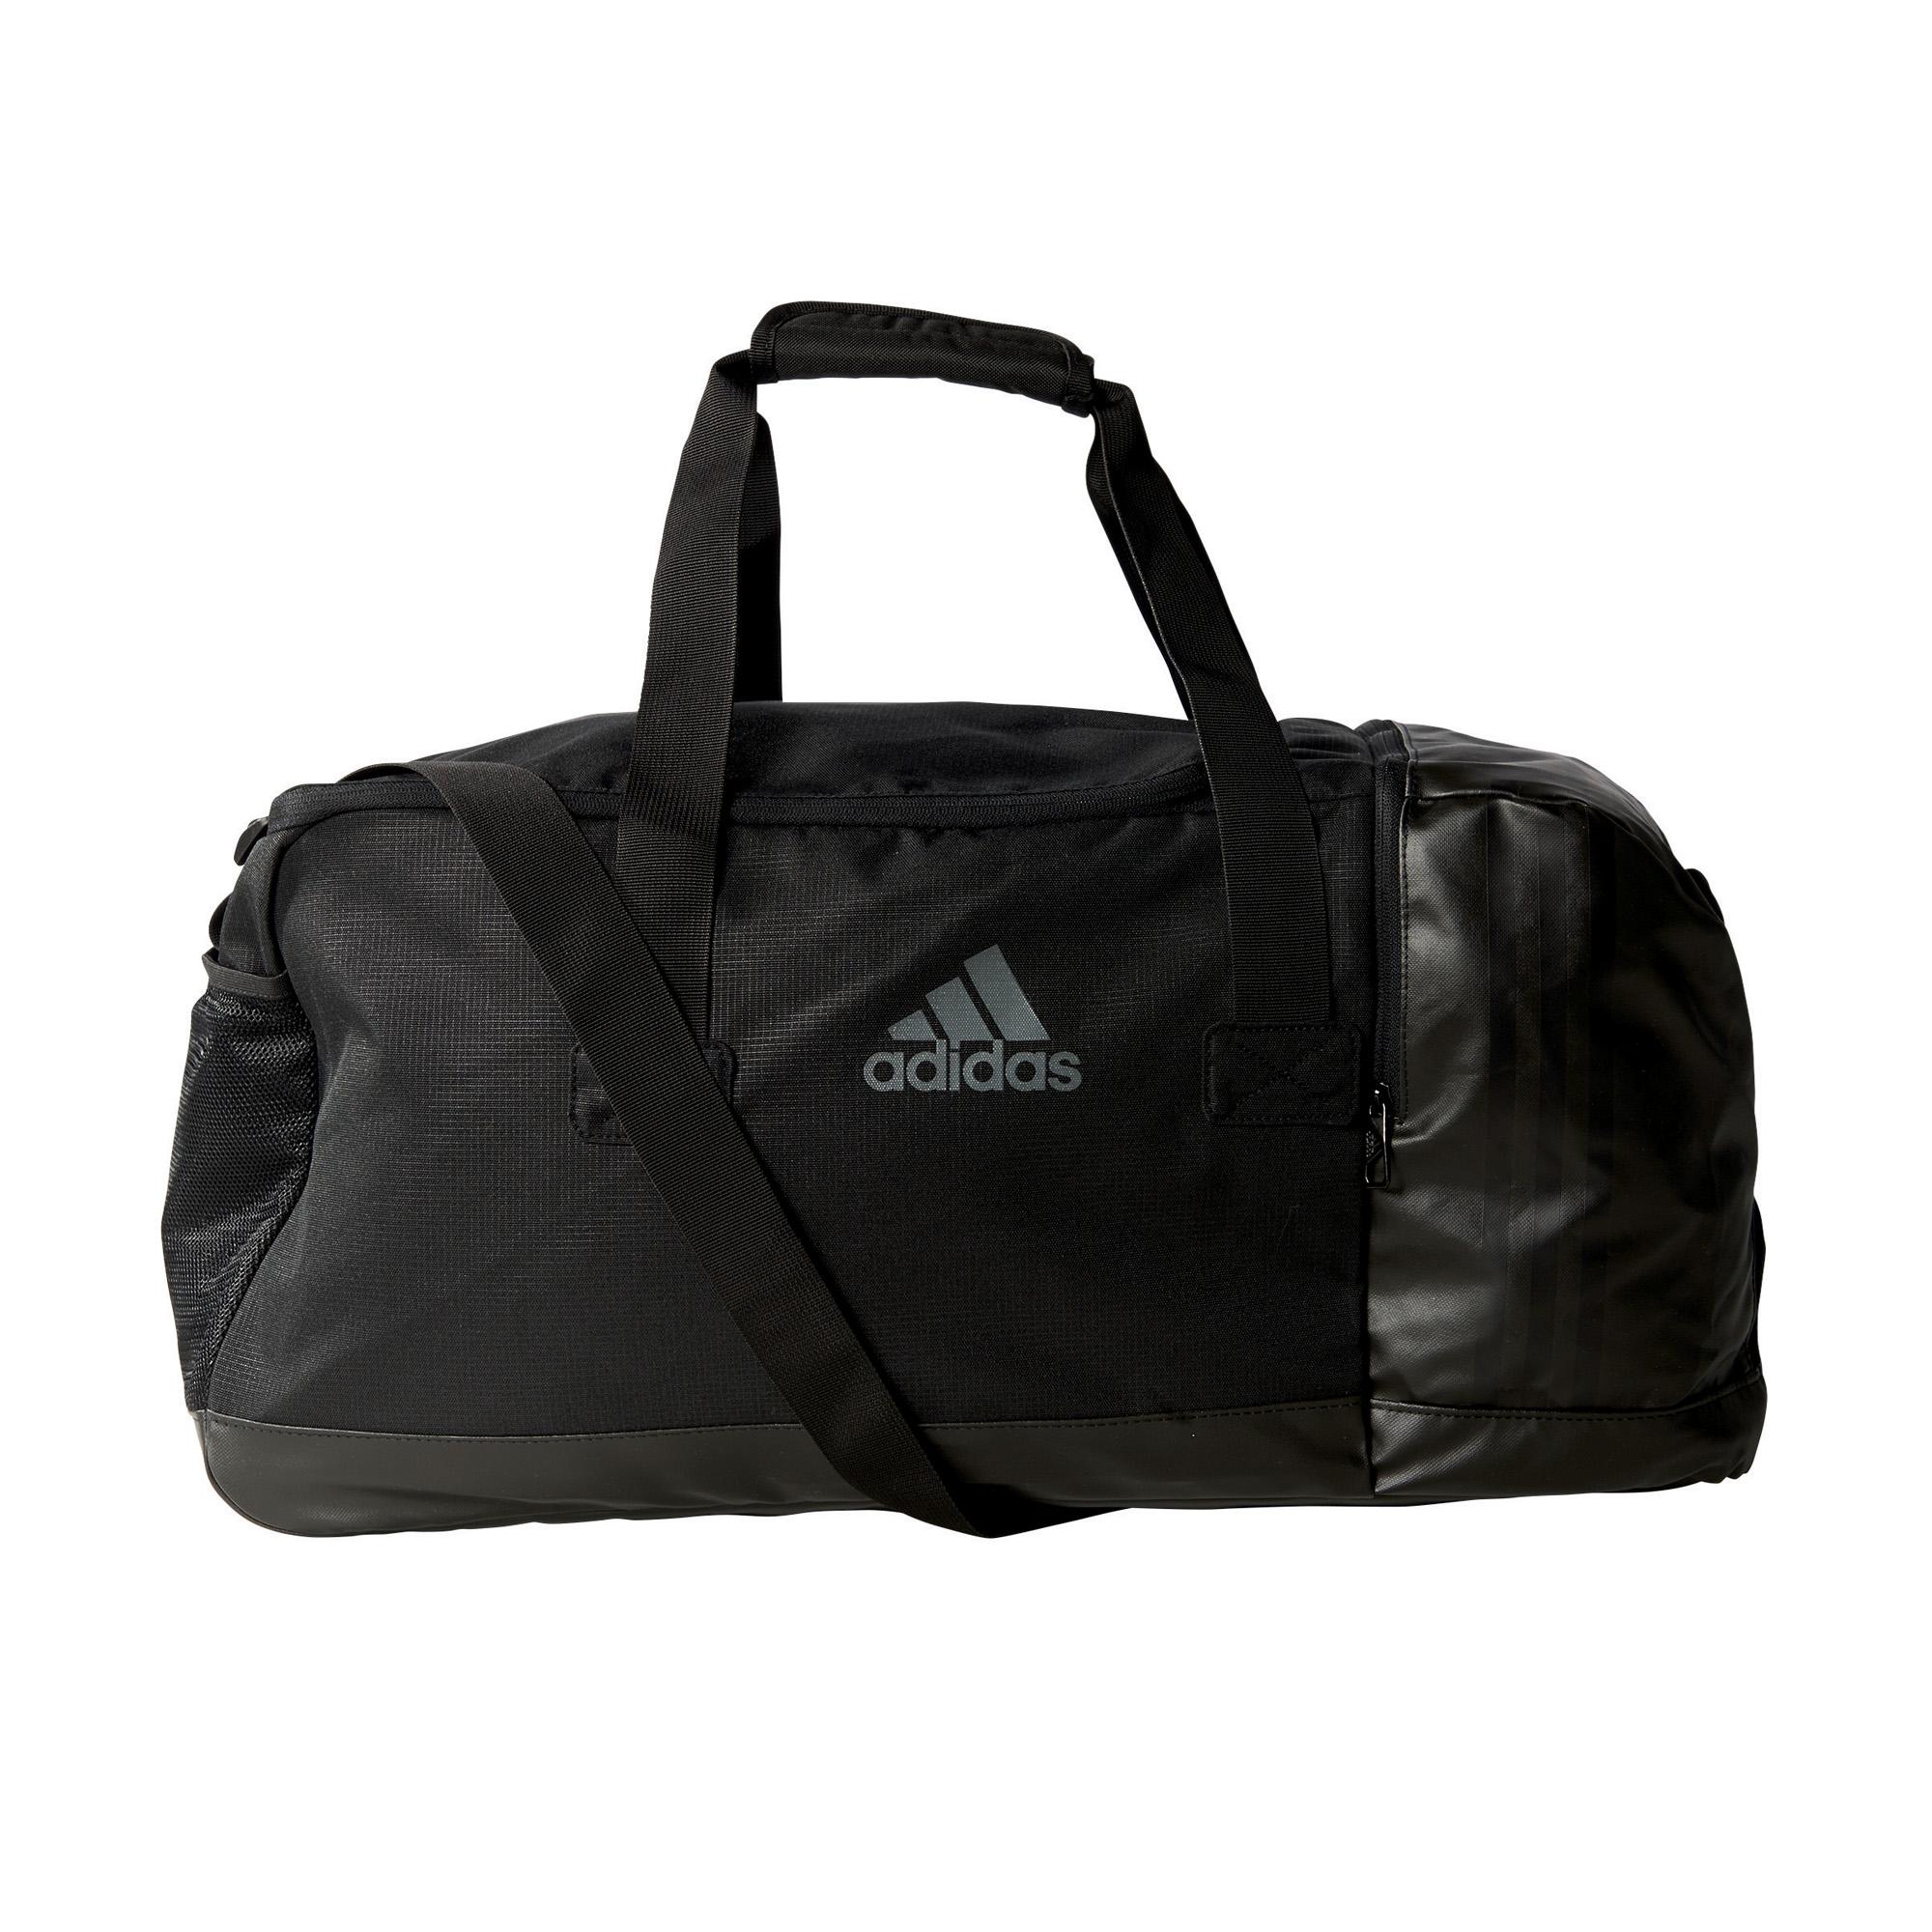 adidas Sporttasche 3S Performance Teambag AJ9993 M